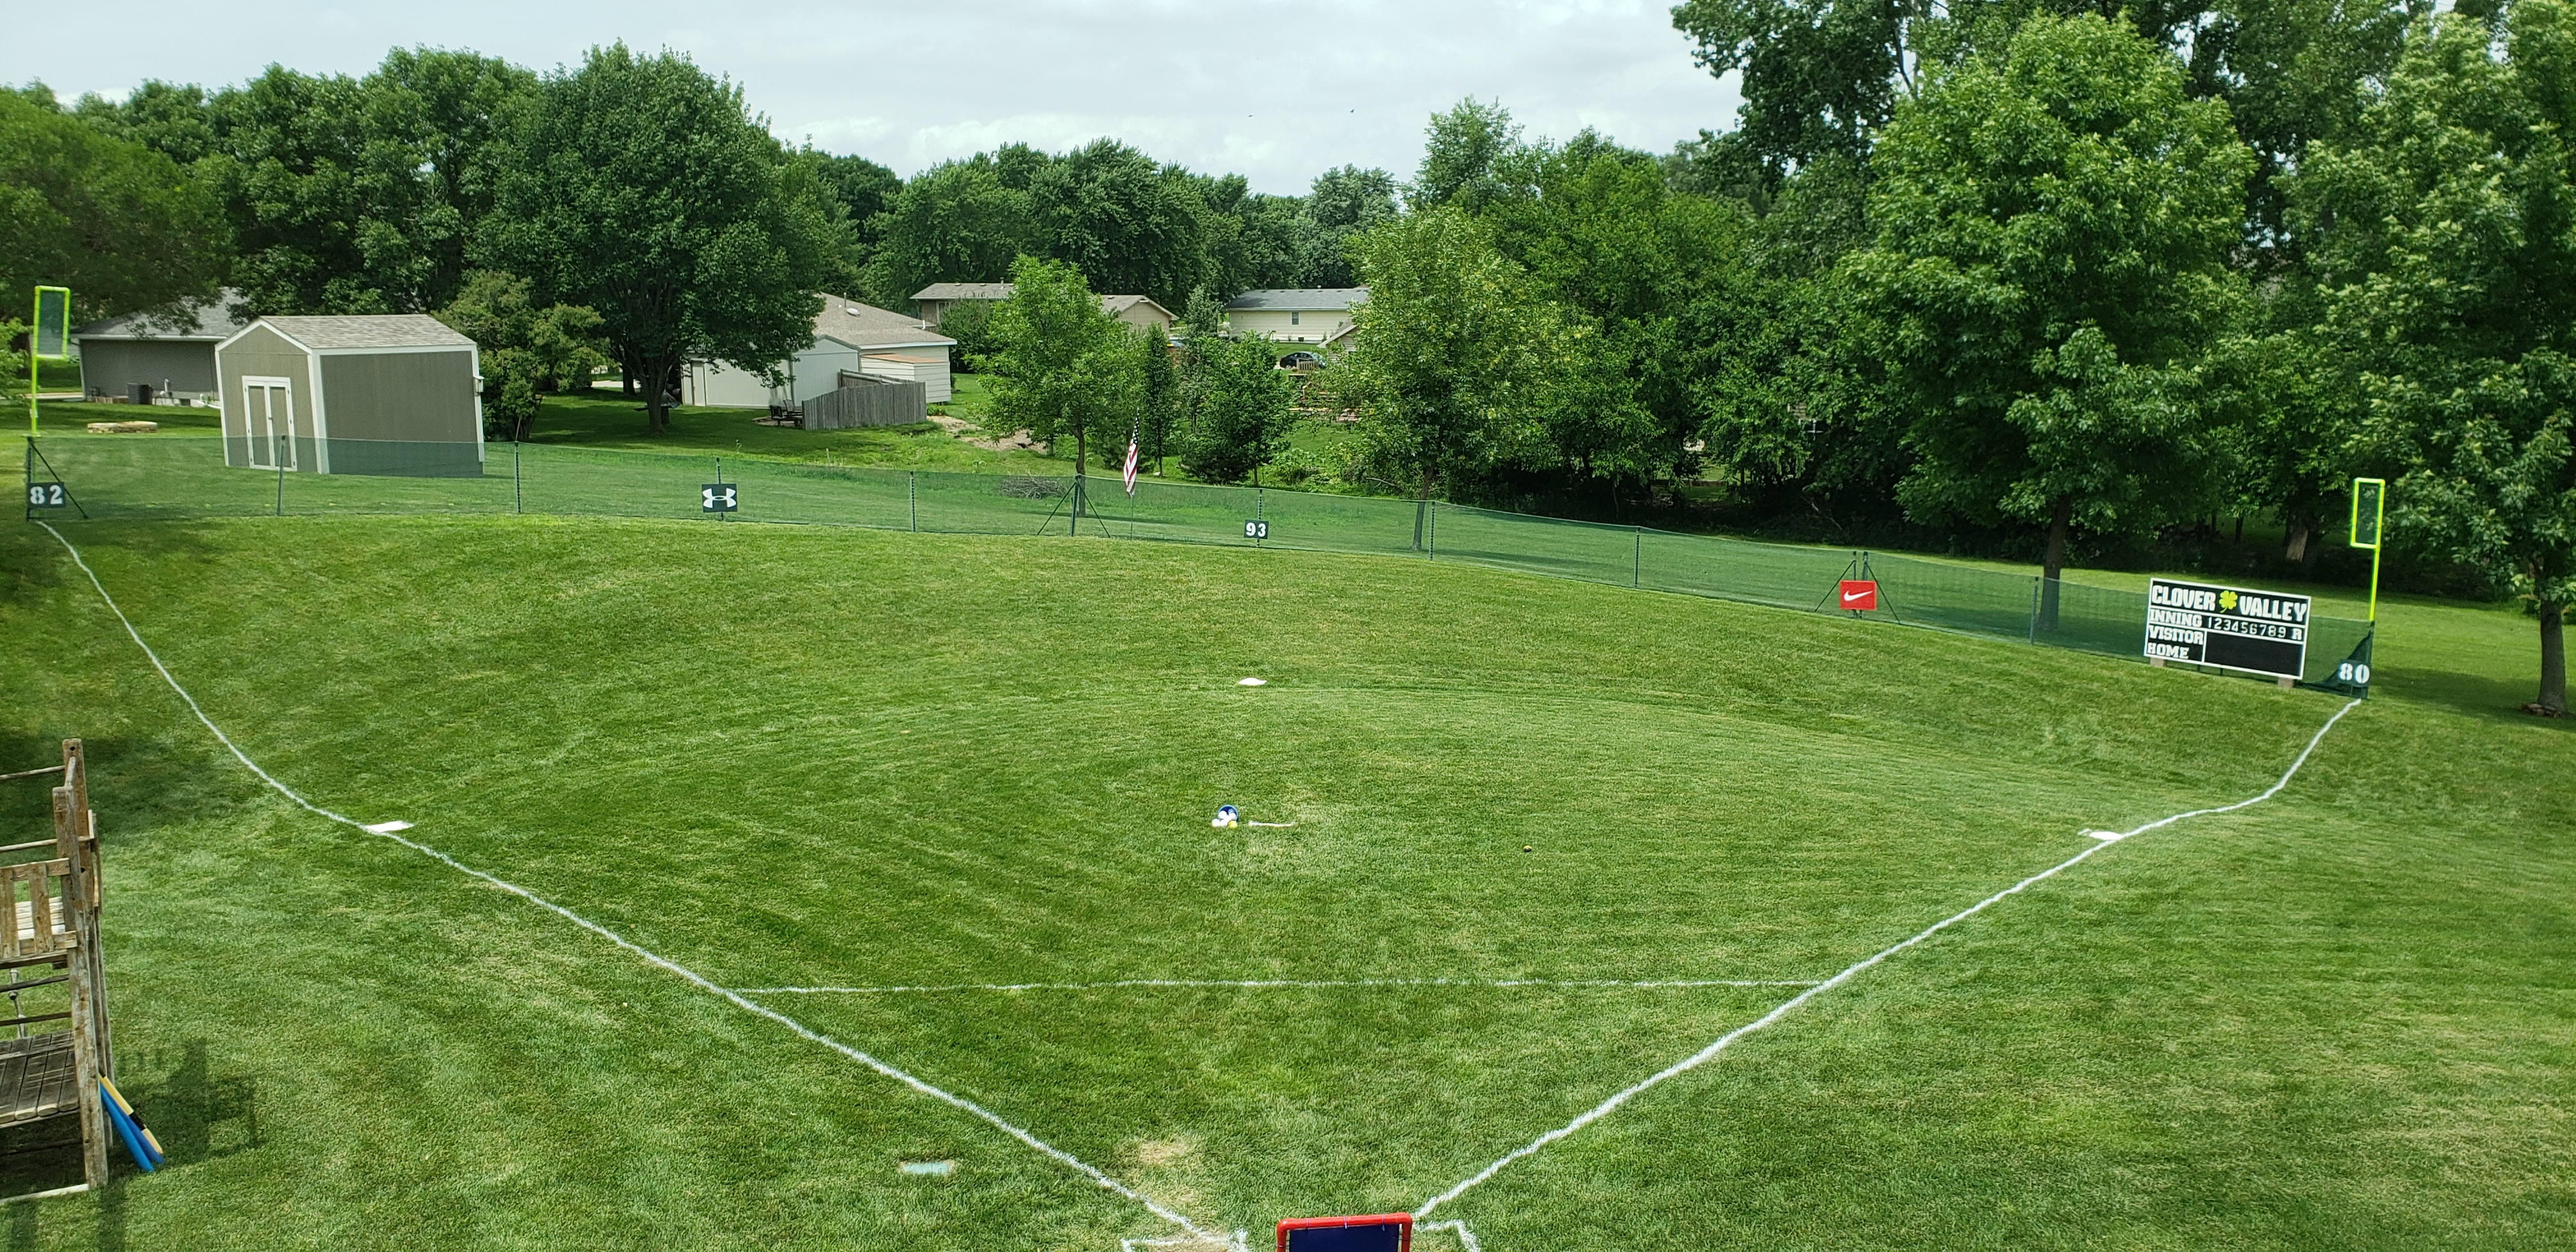 clover-wiffle-ball-field-3.jpg